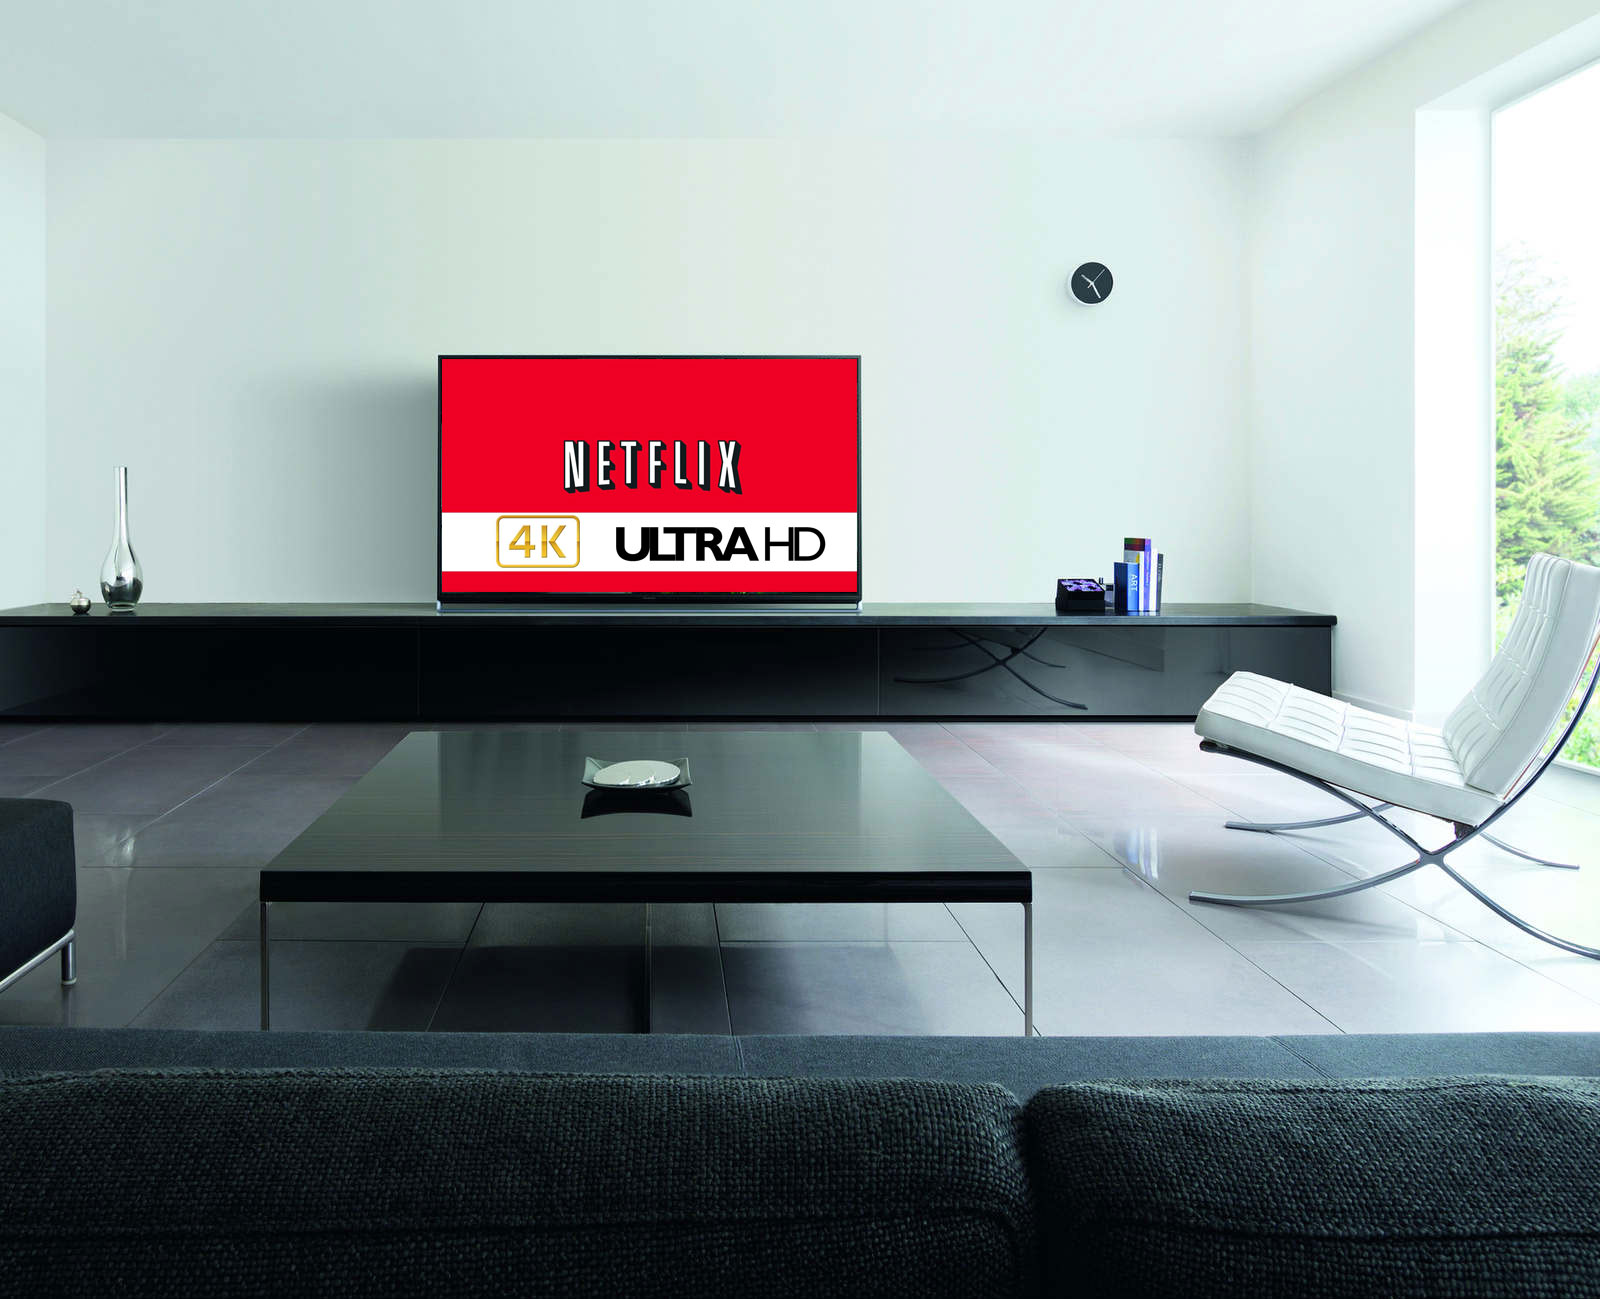 Die Panasonic AXW804 Serie kann ab 11.11. Netflix in 4K